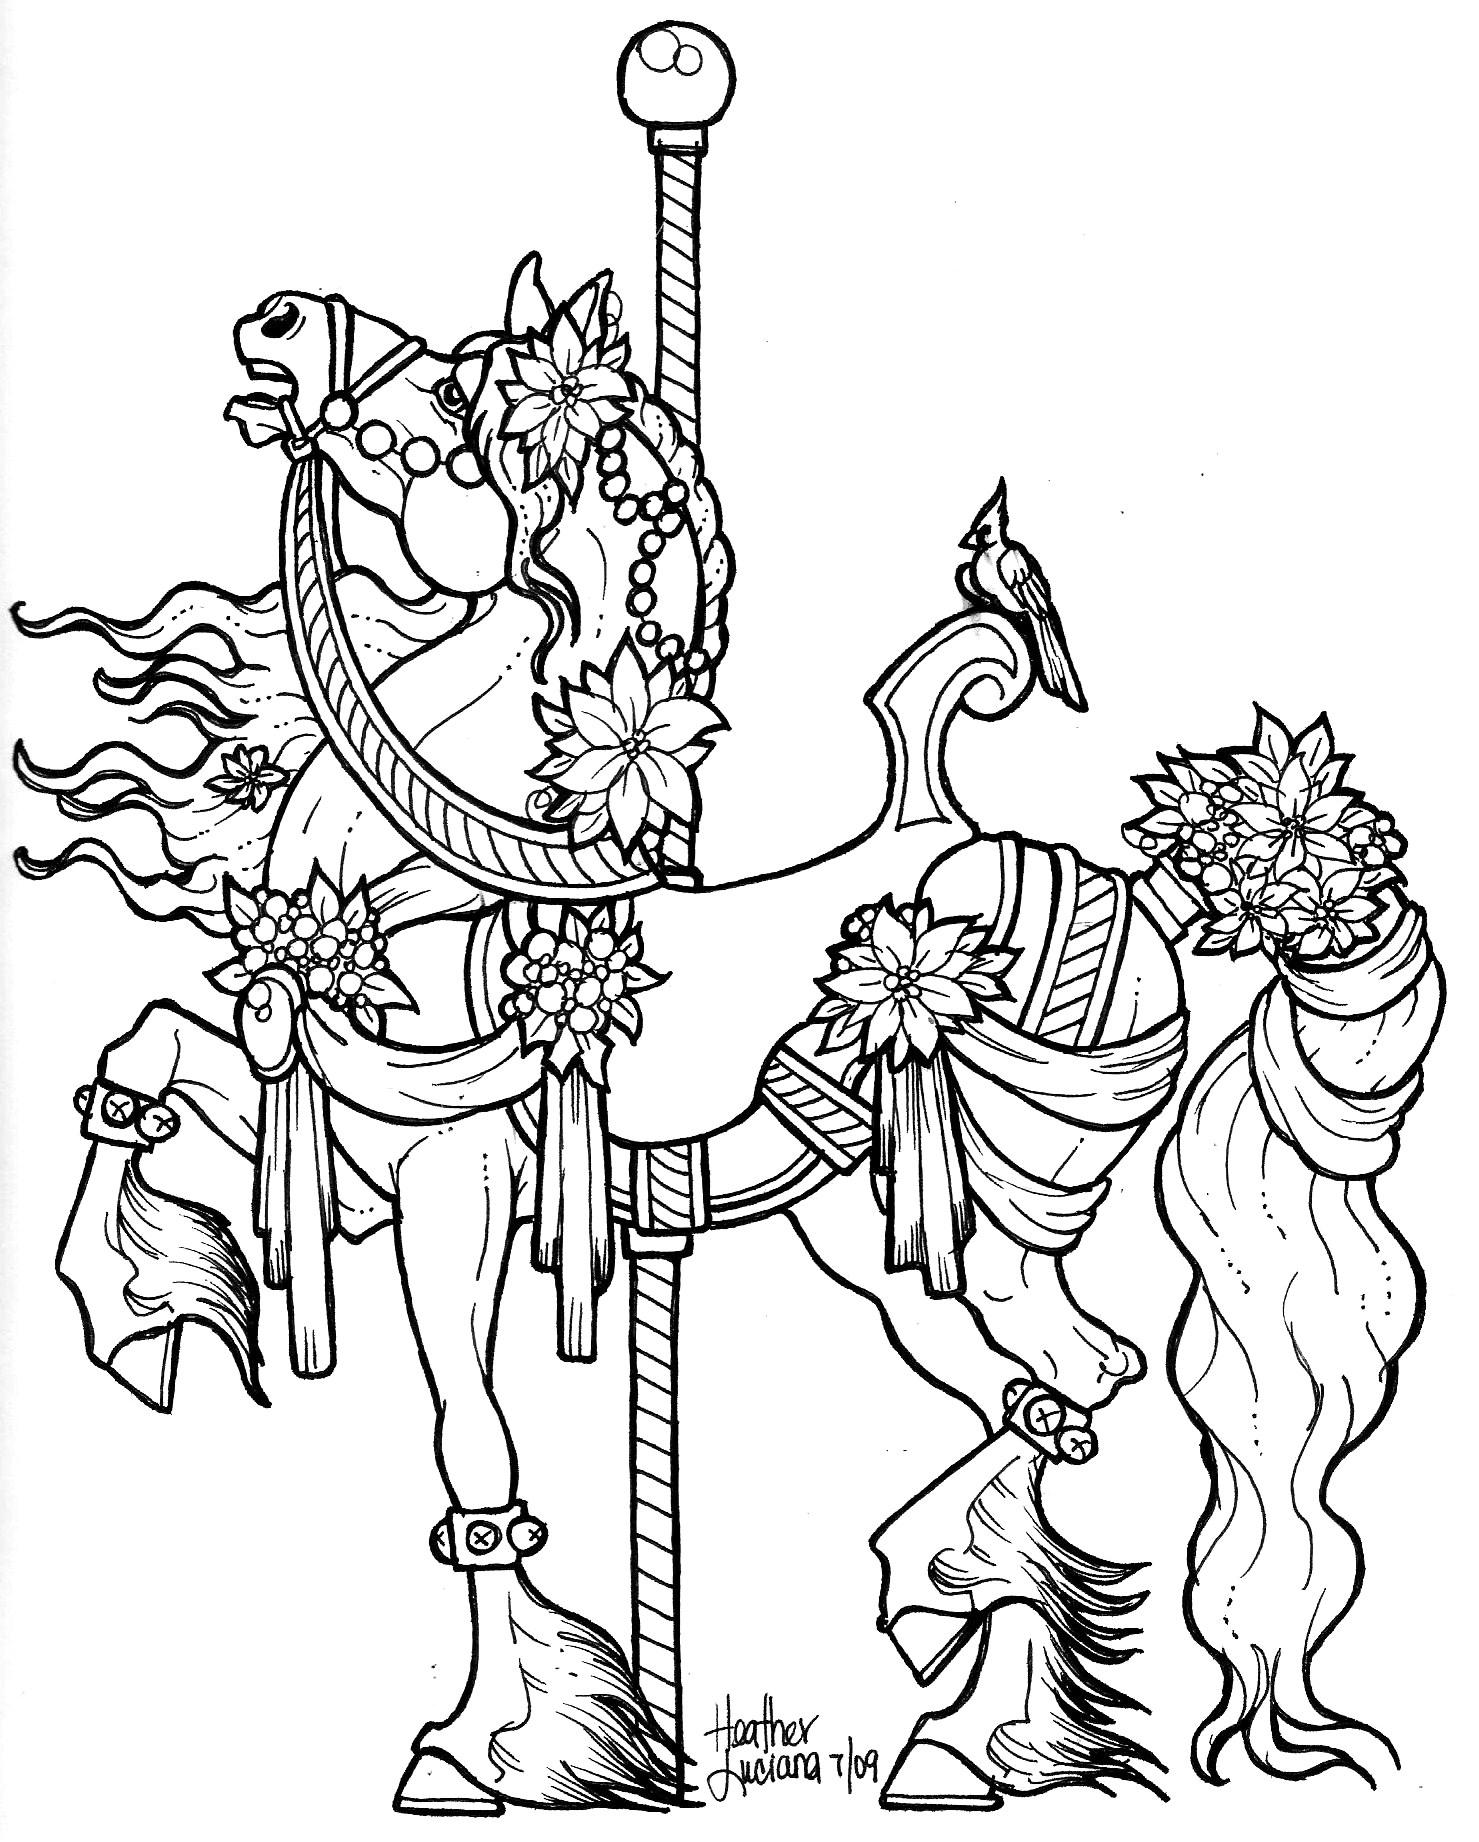 Carousel Horse Drawing At GetDrawings